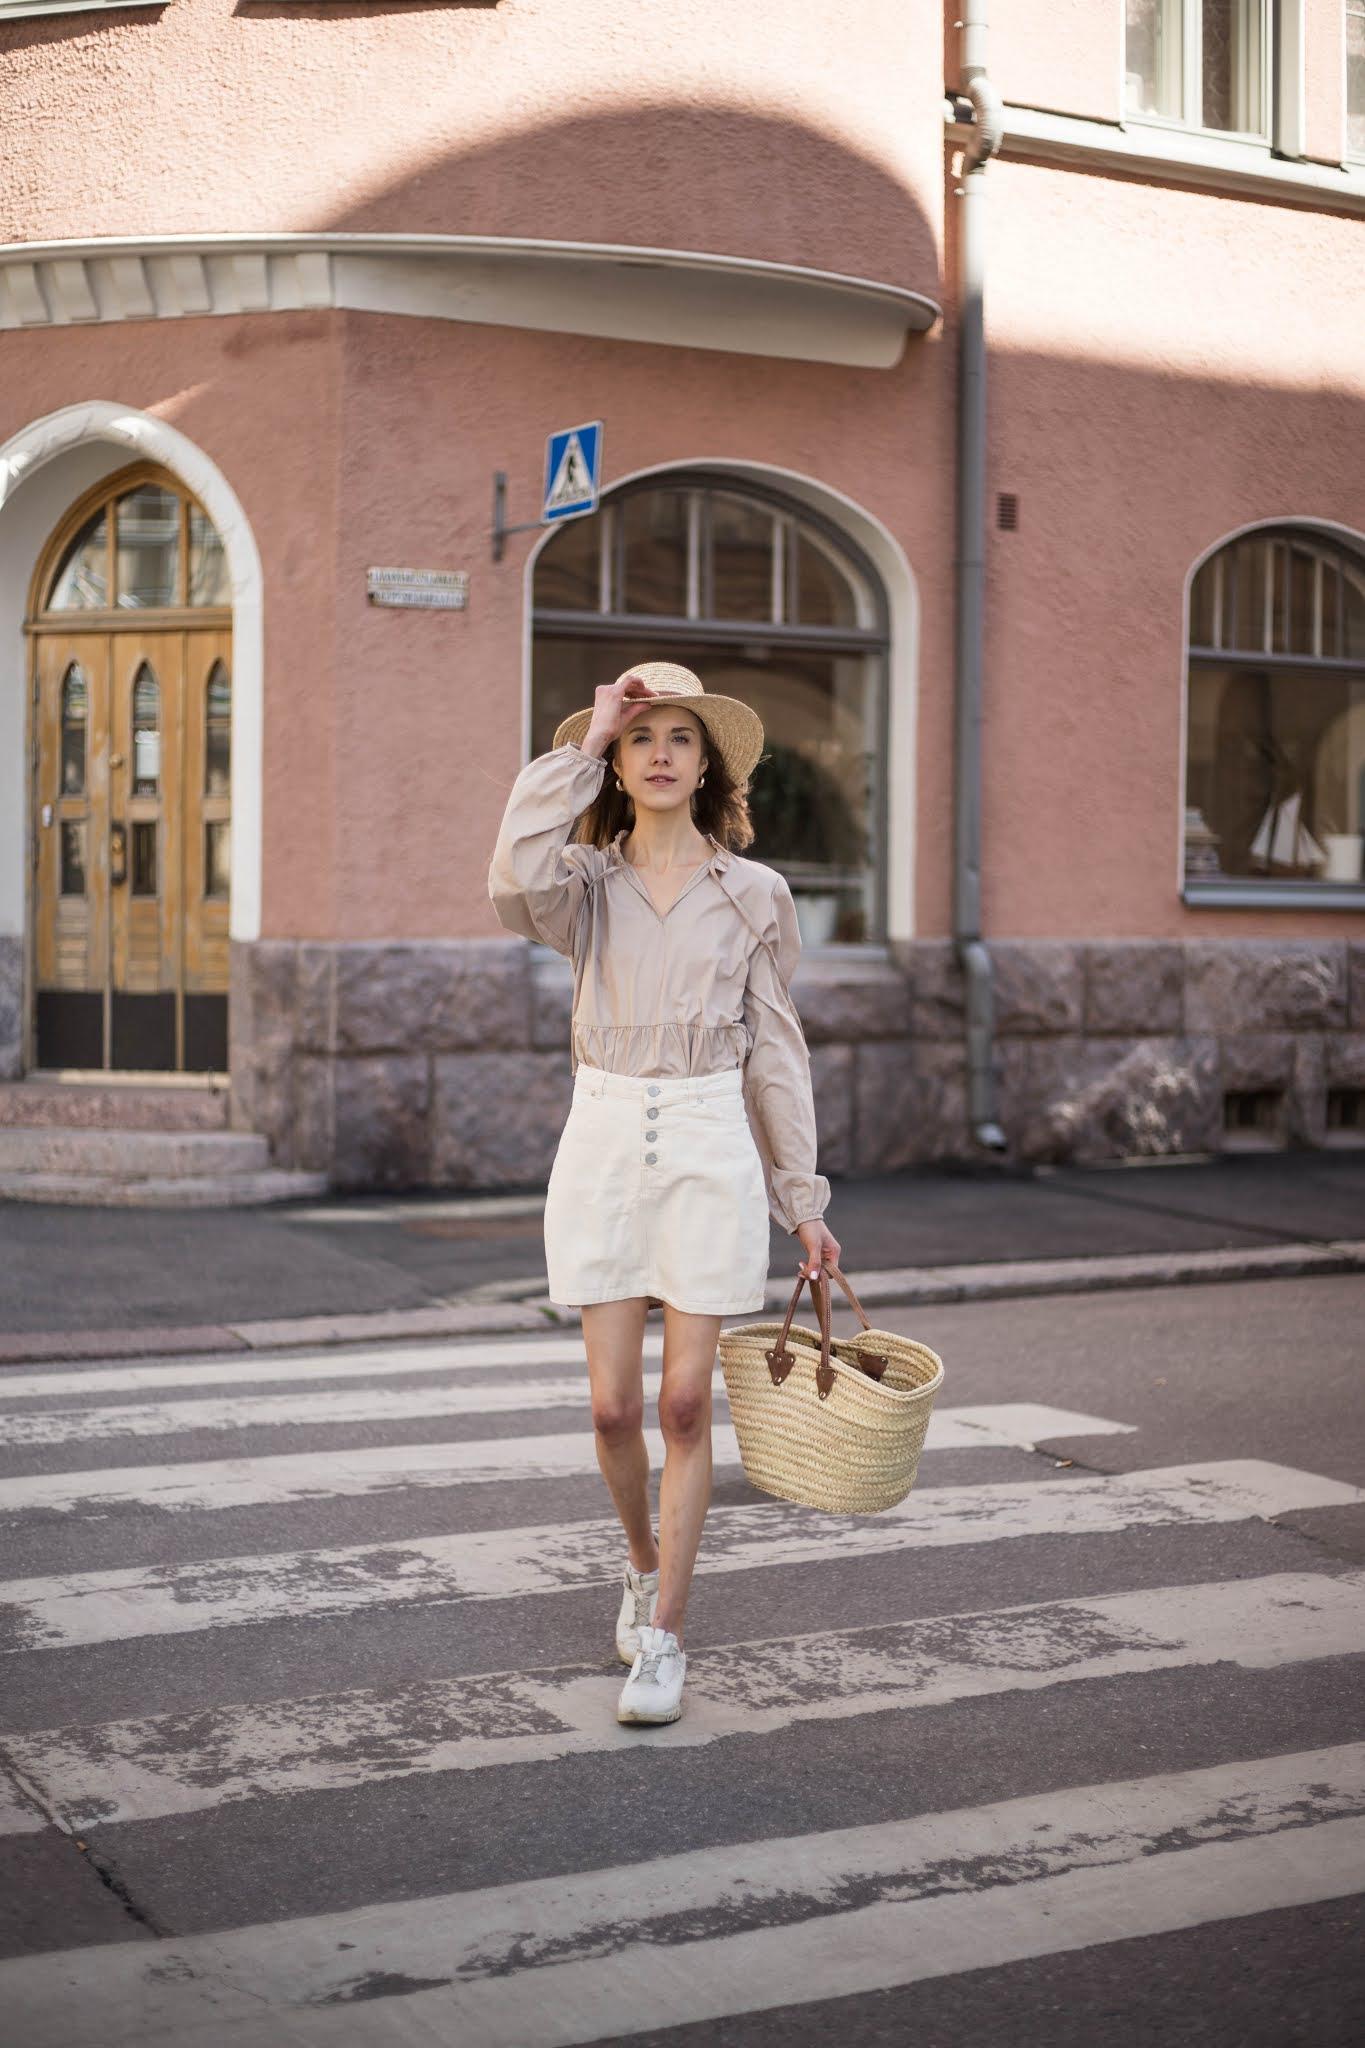 Neutraali kesäasu: valkoinen farkkuhame, beige pusero, olkihattu, korilaukku & lenkkarit // Neutral summer outfit: white denim skirt, beige blouse, straw hat and bag, white trainers